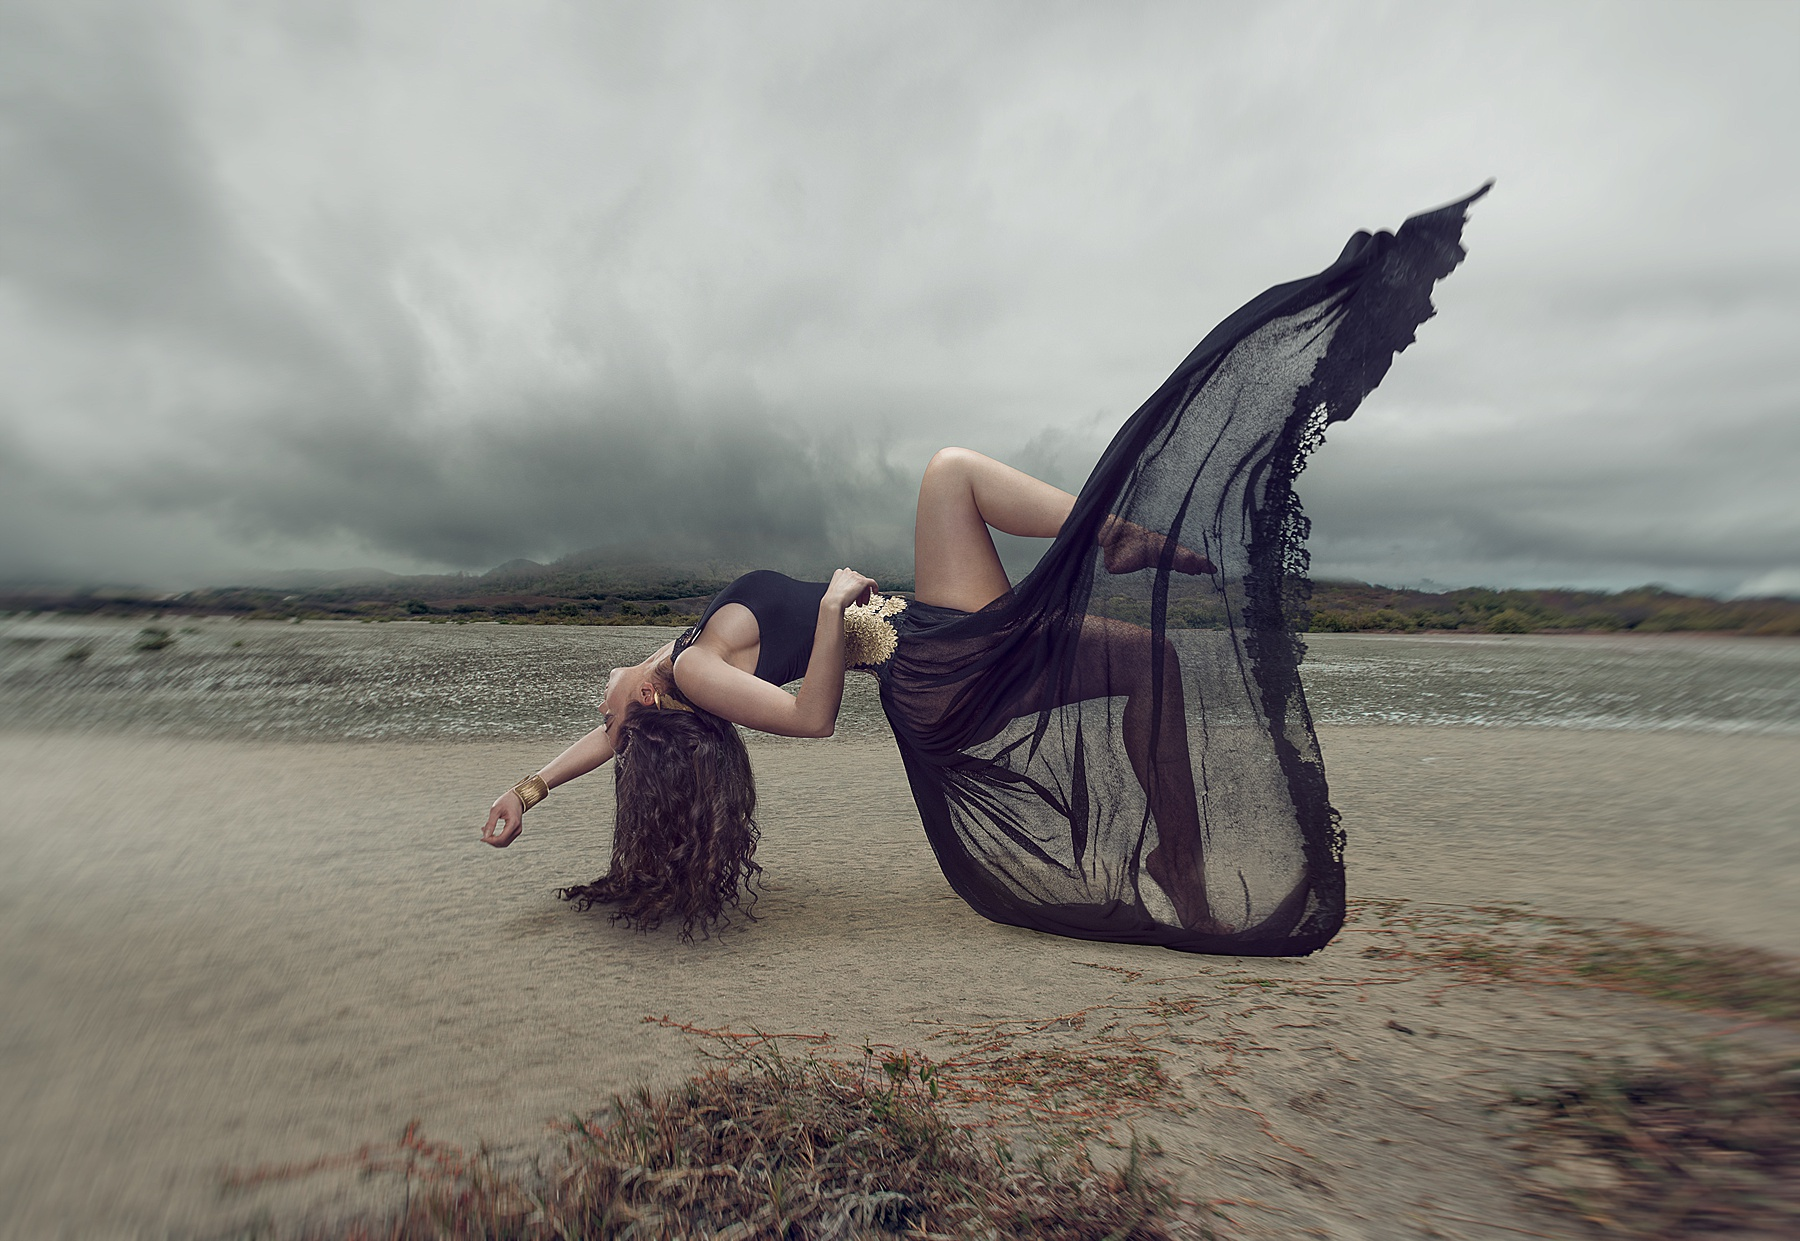 levitation_Montage_By David Pochal.jpg